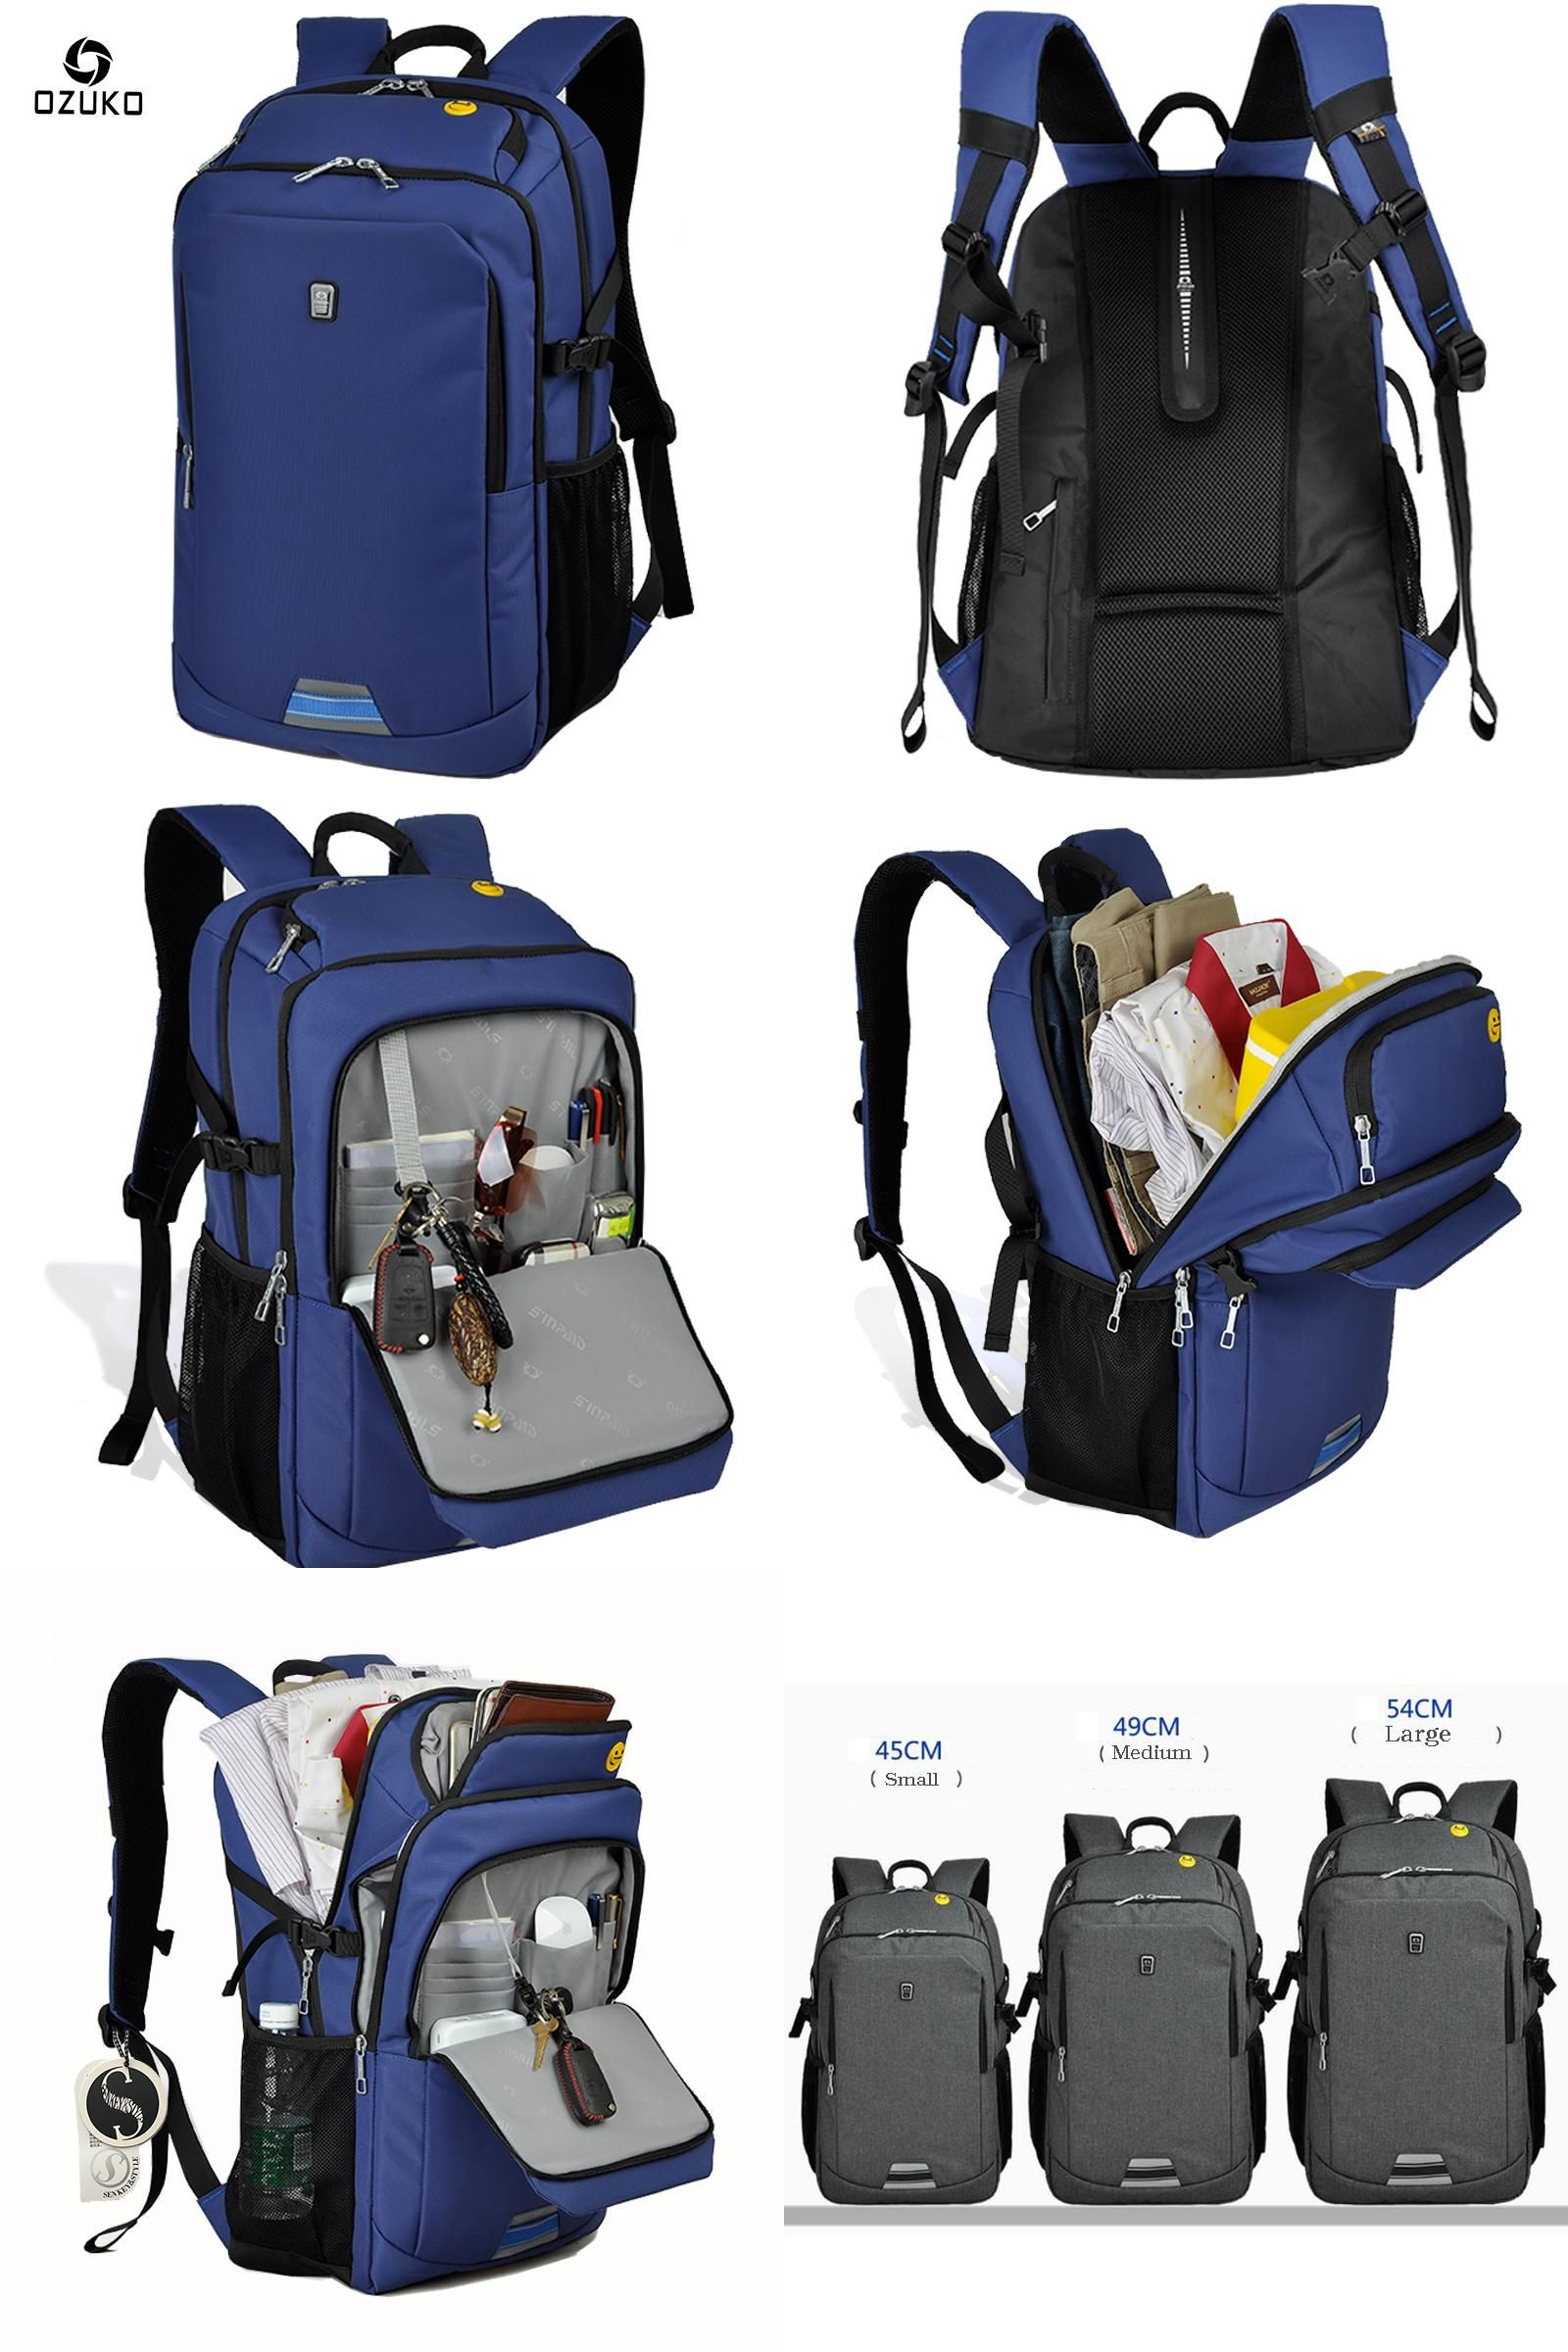 15795890c8a79  Visit to Buy  2017 OZUKO Laptop Bag Men s Business Backpacks Large  Capacity Mochila Fashion College Casual Travel School Bag Waterproof Fabric    ...